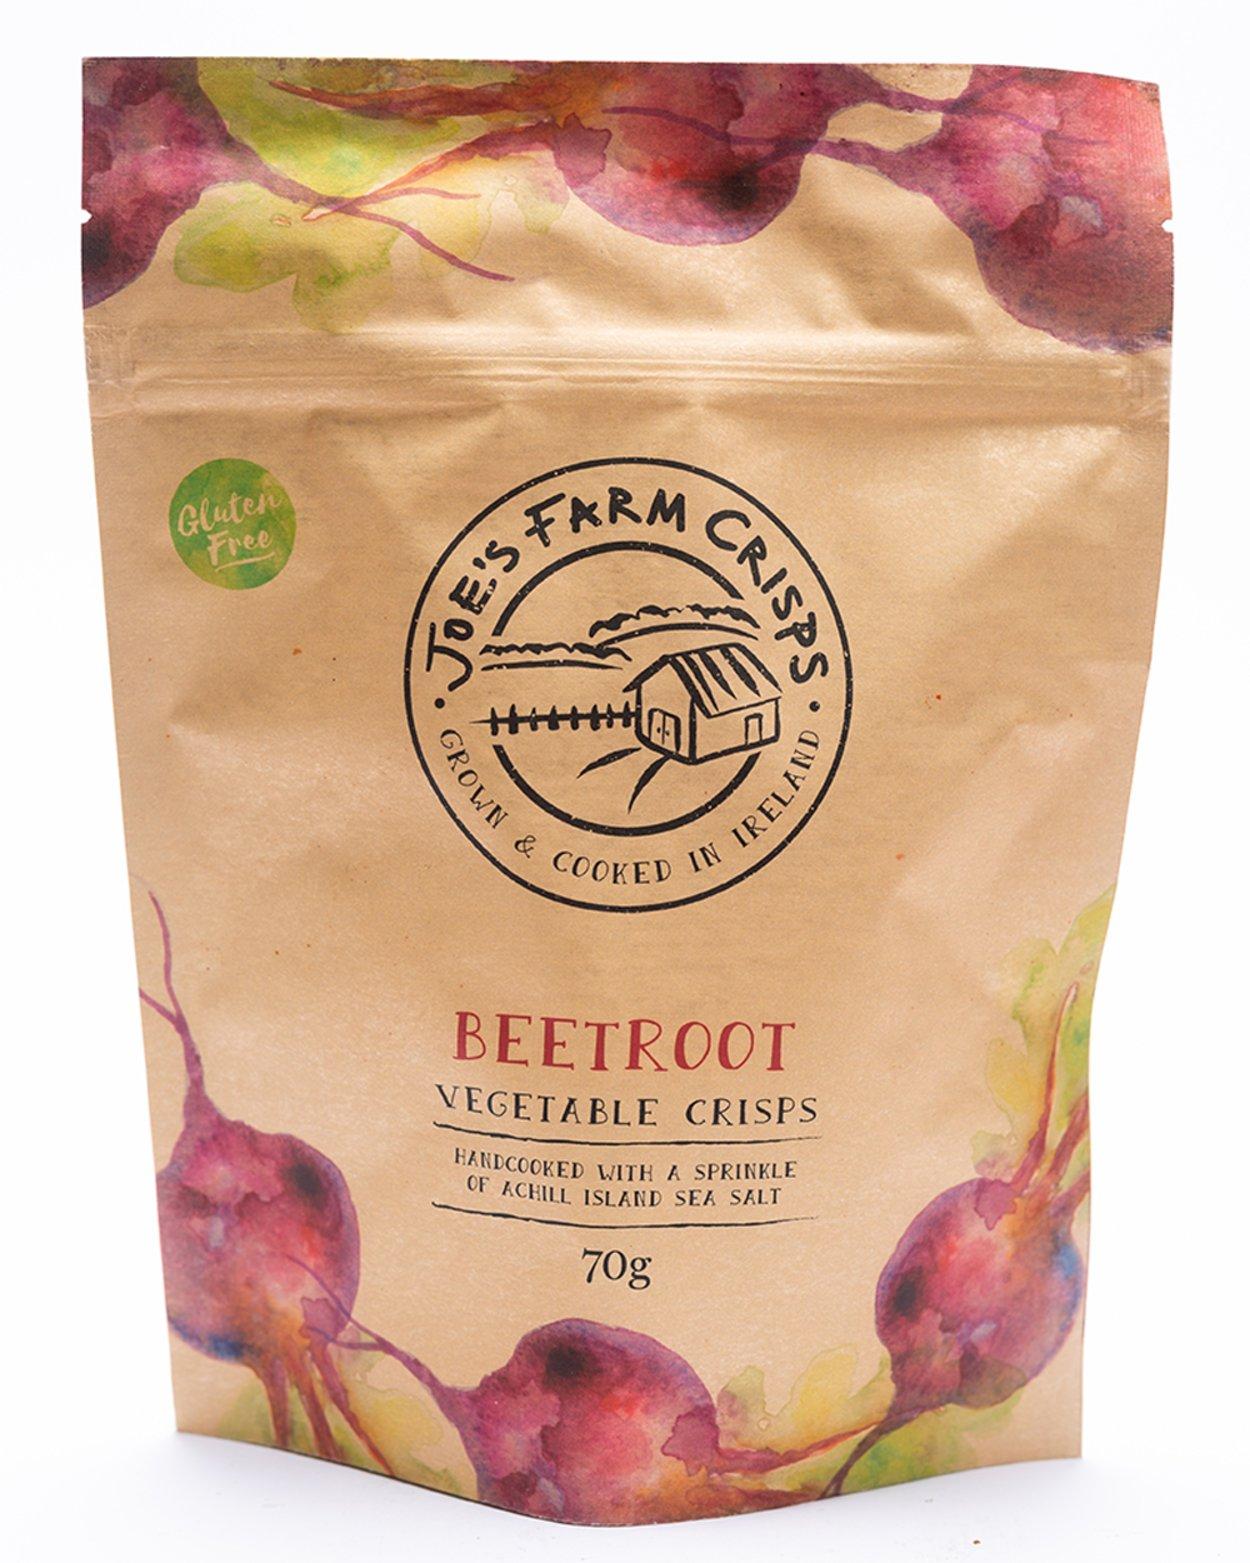 Joe's Farm Crisps Gluten Free Beetroot Vegetable Crisps